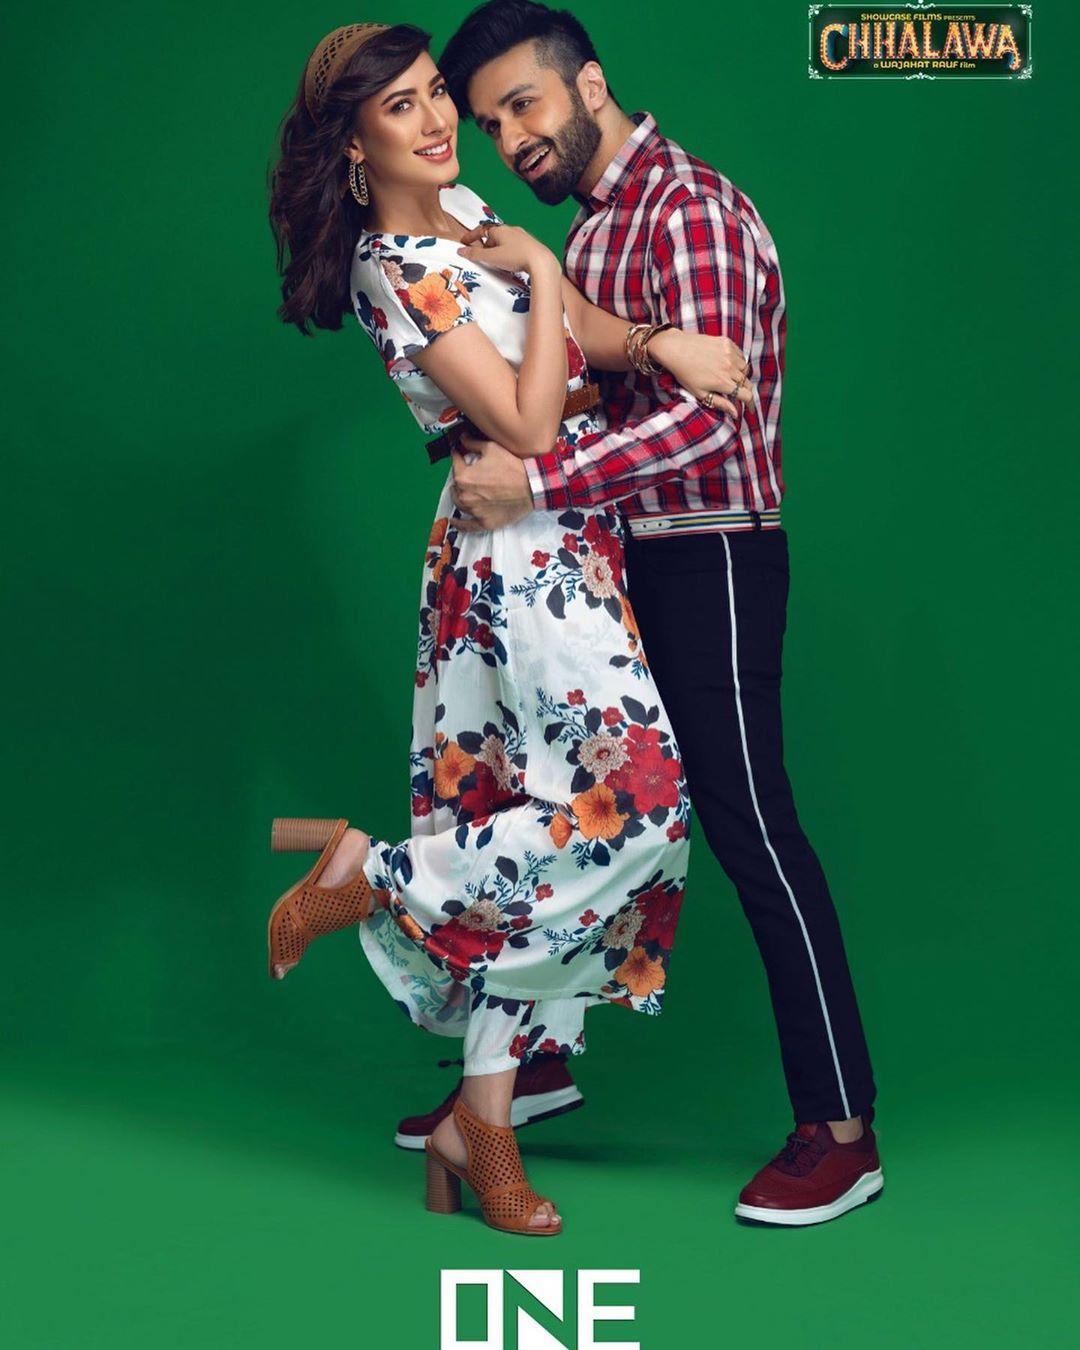 New Photoshoot of Mehwish Hayat and Azfar Rehman for a Clothing Brand